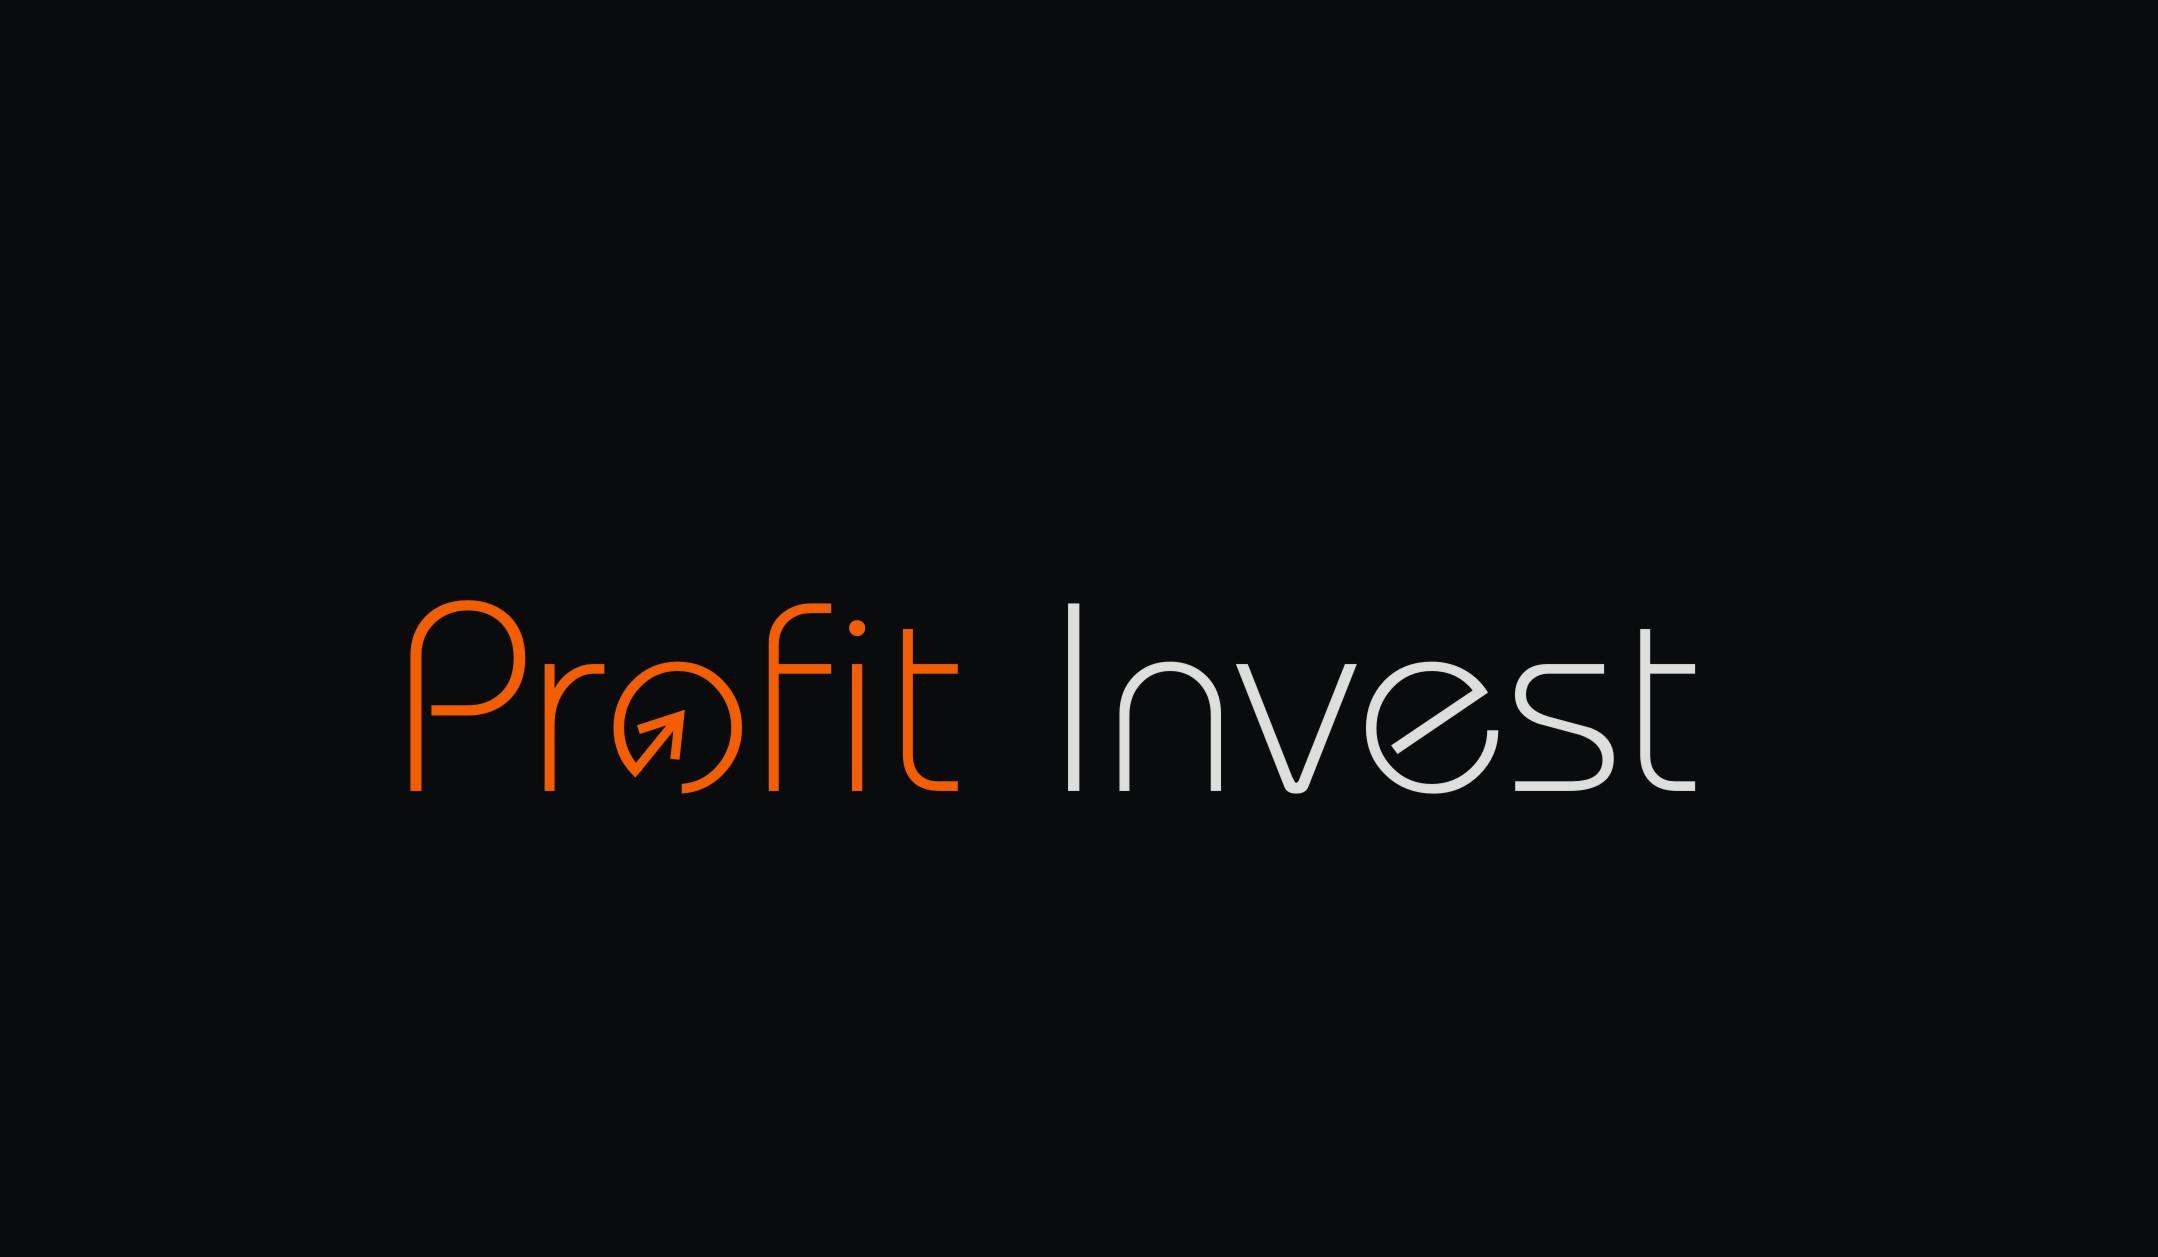 Разработка логотипа для брокерской компании фото f_4f219c6b79dde.jpg